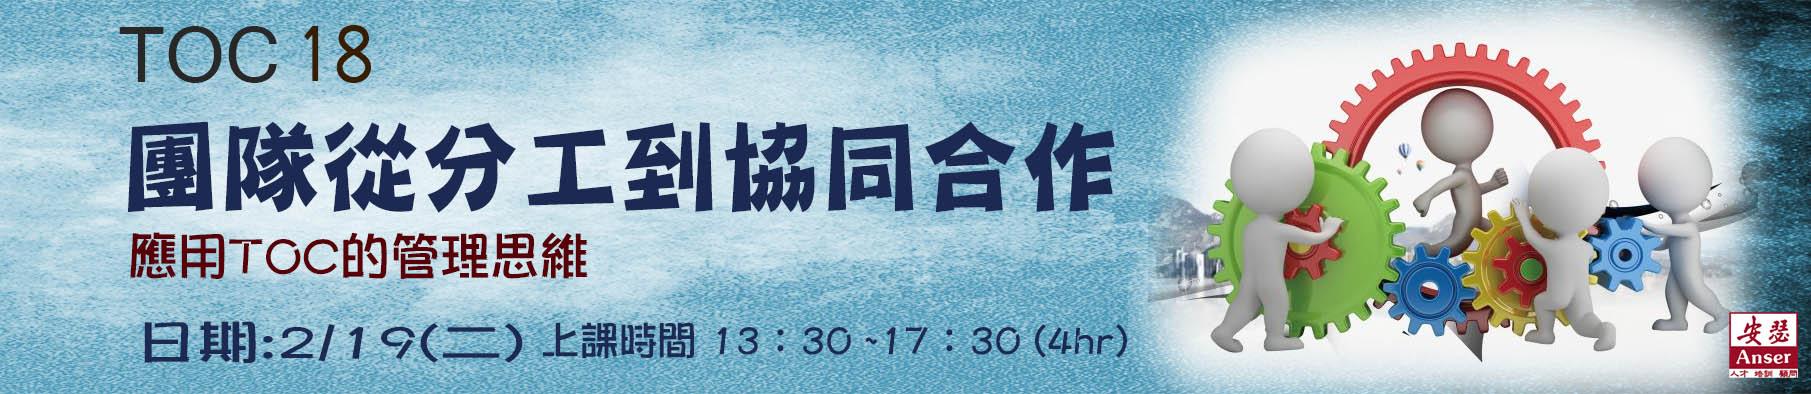 toc18 banner.jpg